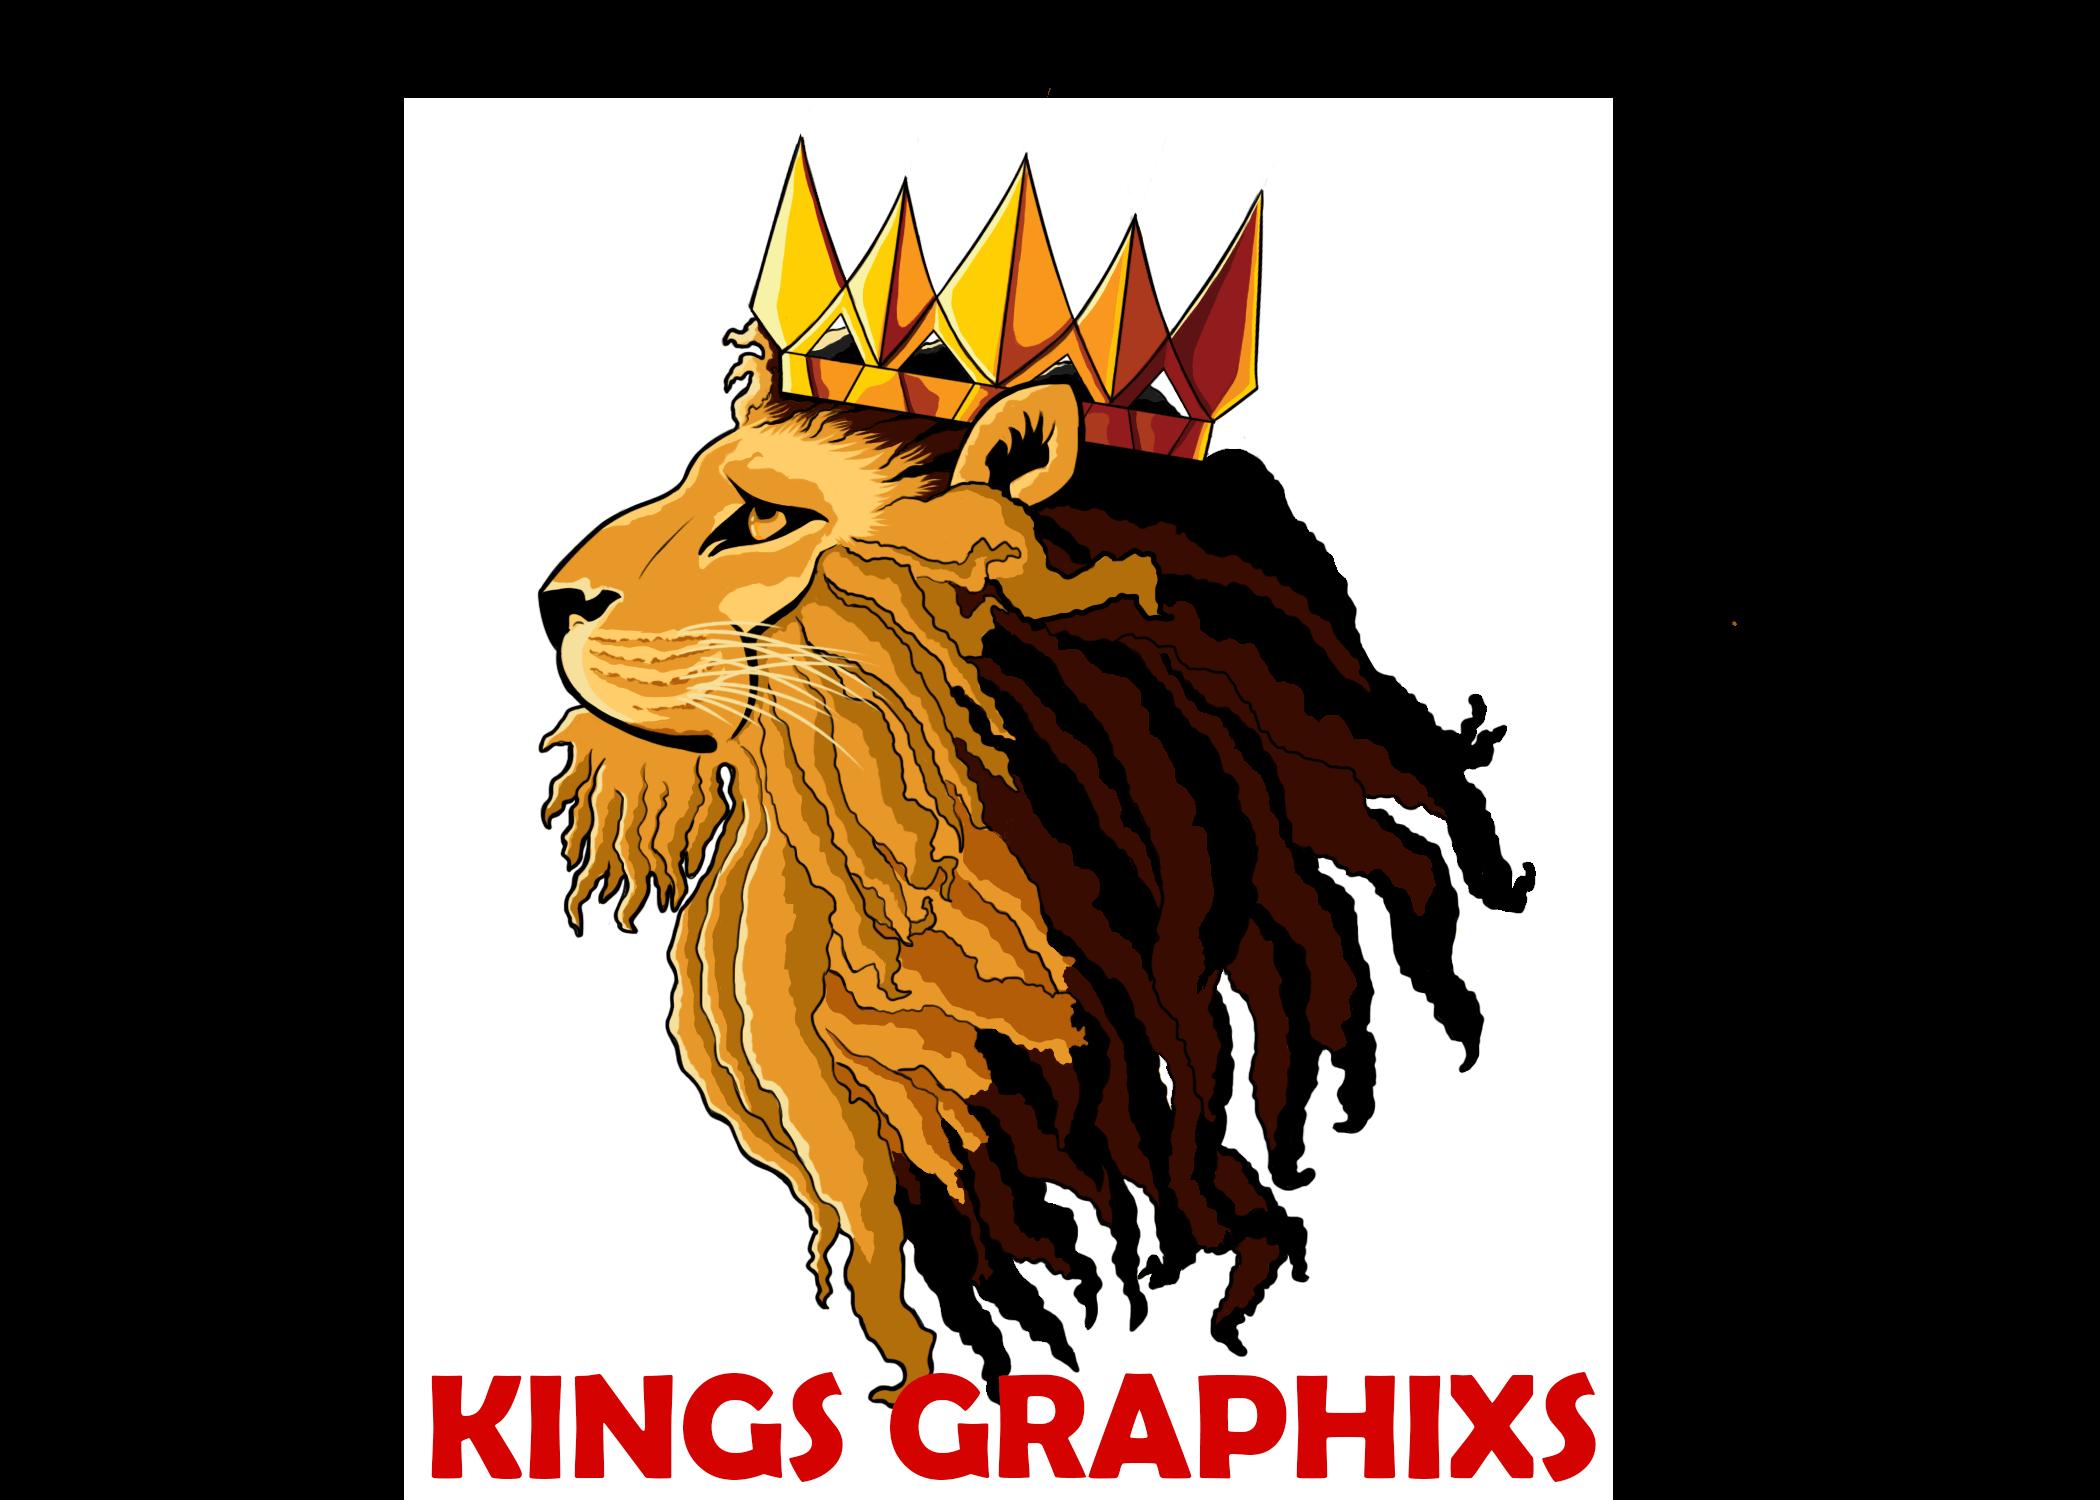 Kings Graphixs